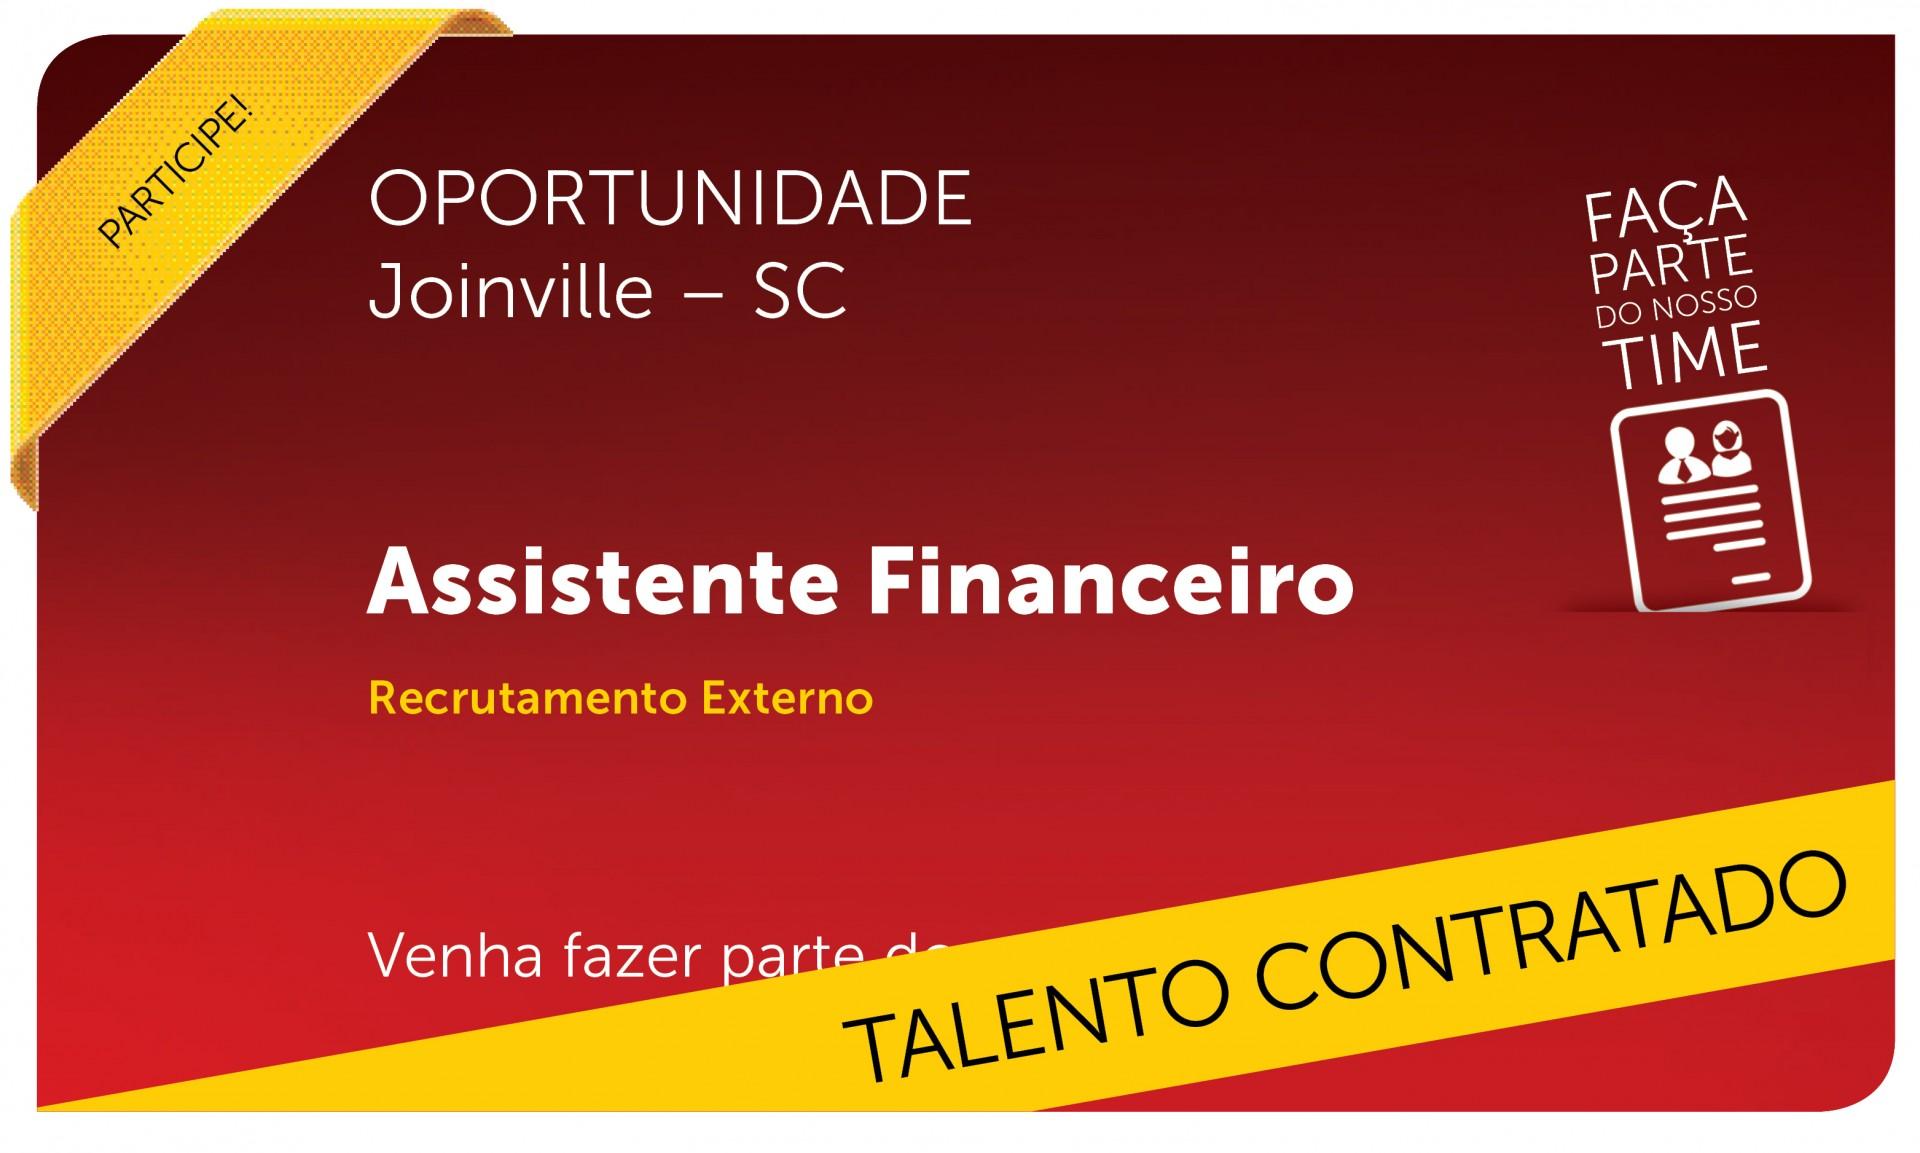 Assistente Financeiro | Joinville - SC